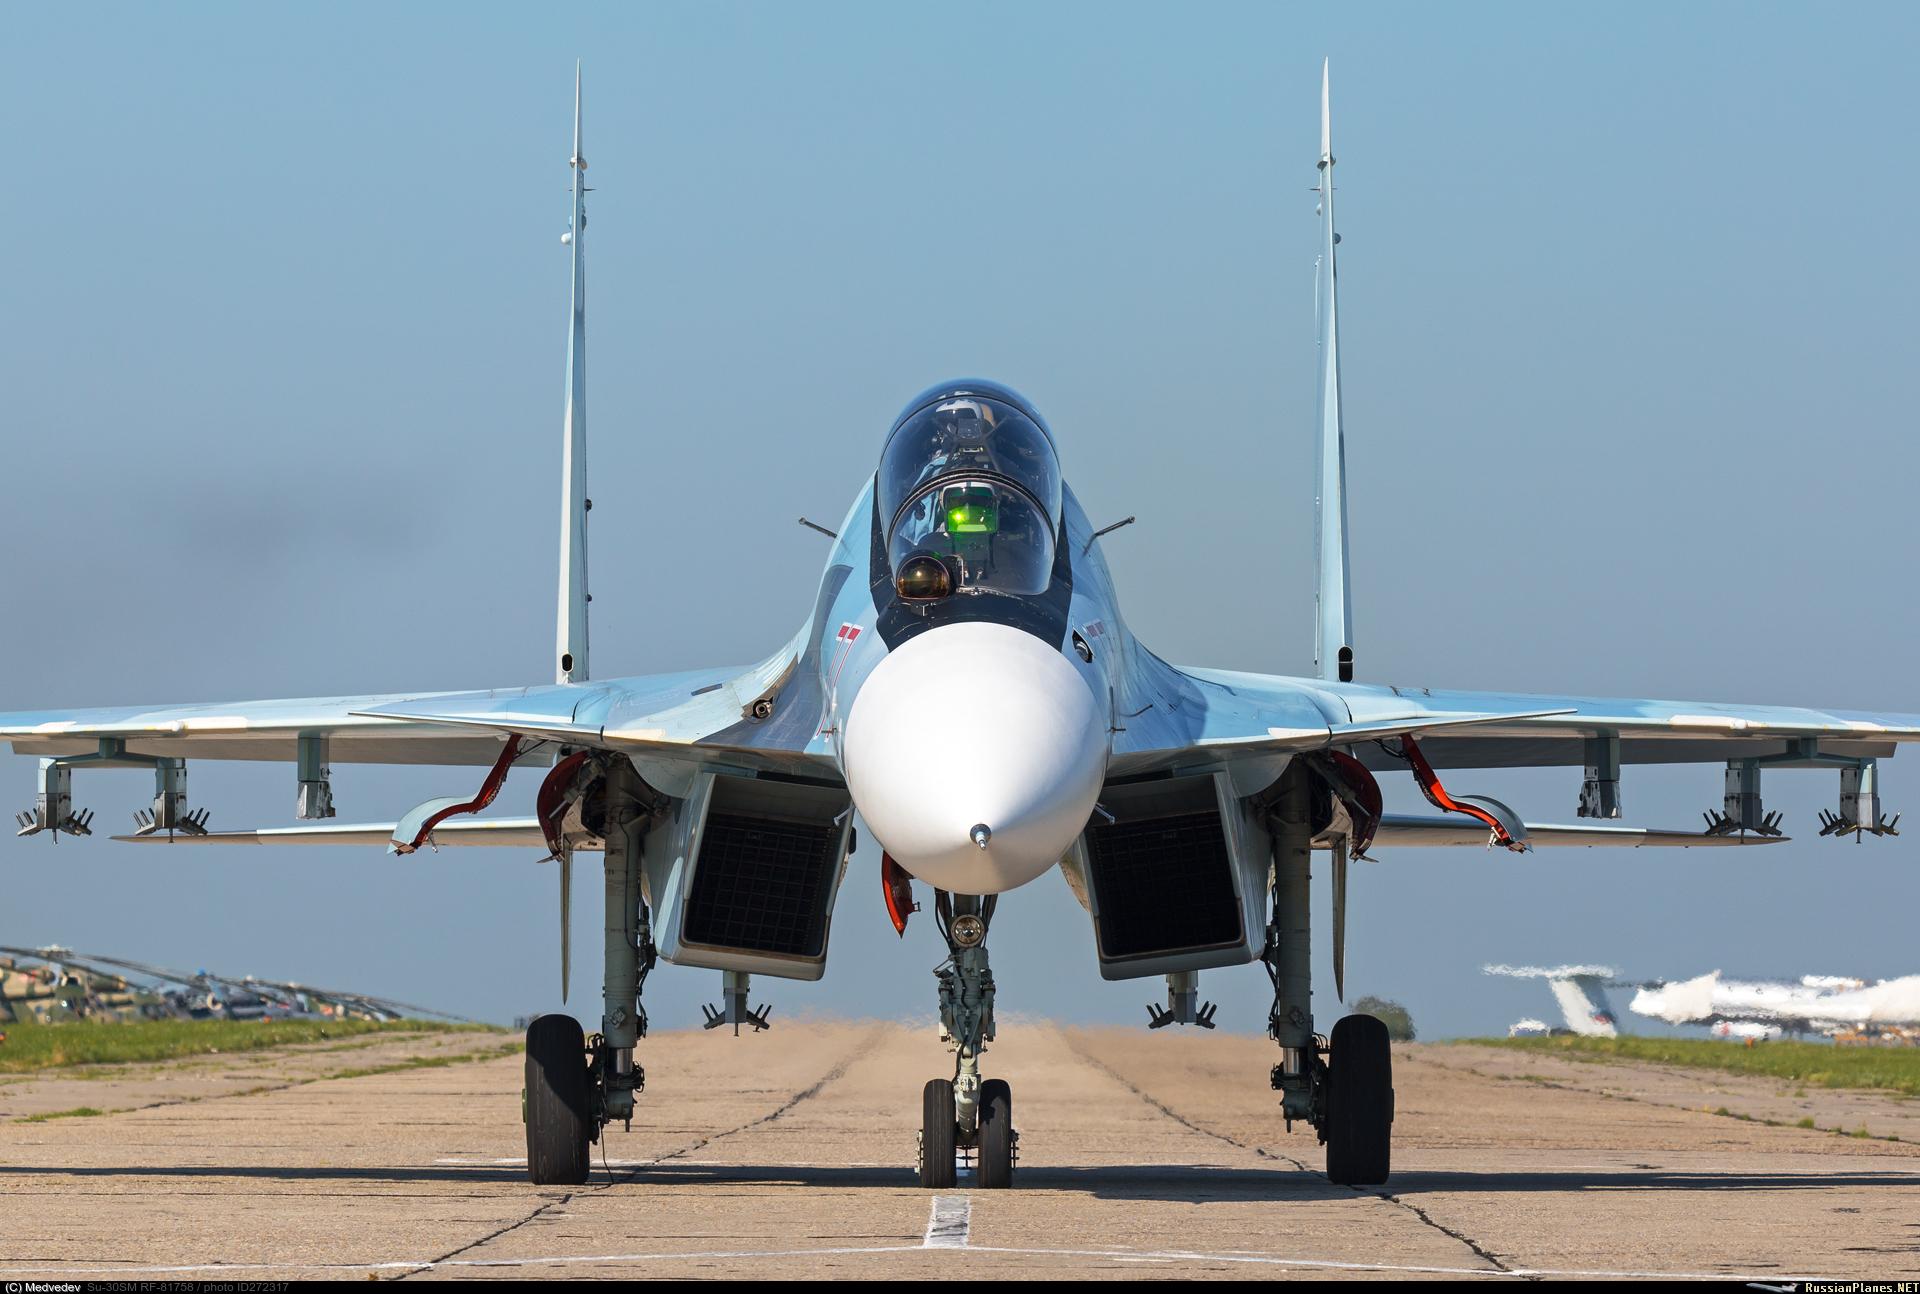 https://russianplanes.net/images/to273000/272317.jpg